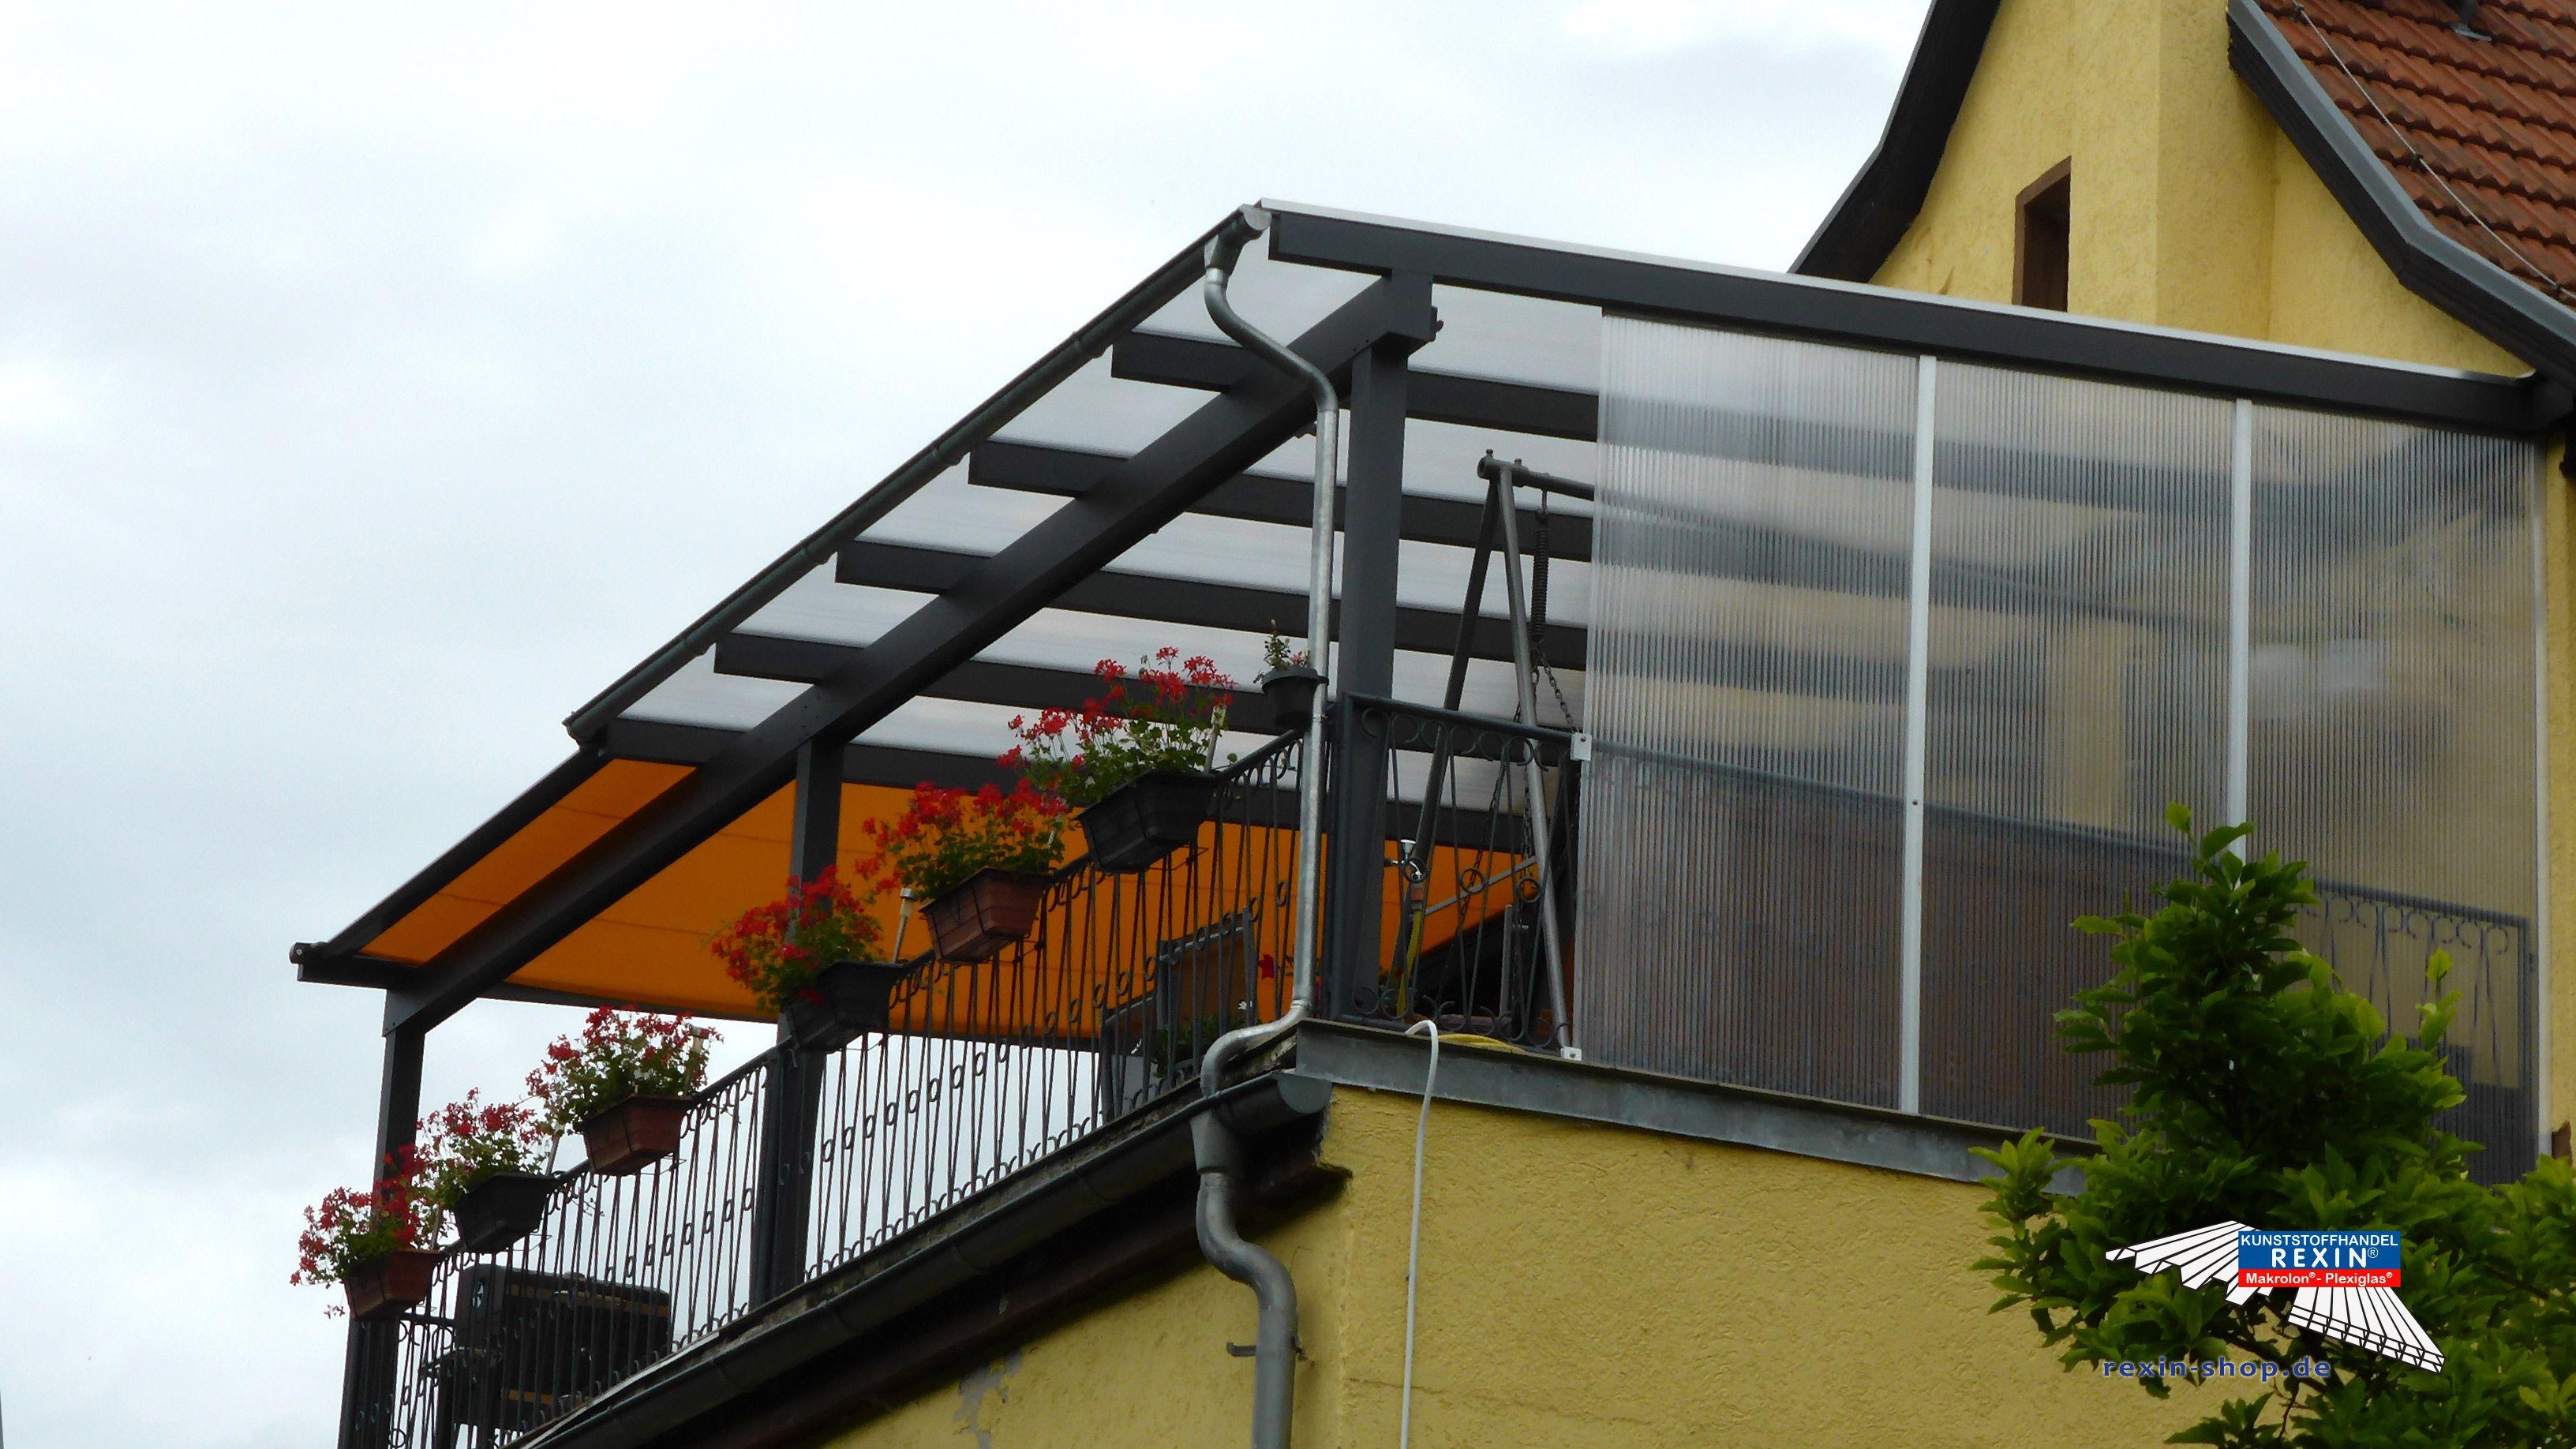 0de4e6aabd457a1f6c1db3c160a36d0b Inspiration Sichtschutz Balkon Einseitig Durchsichtig Schema